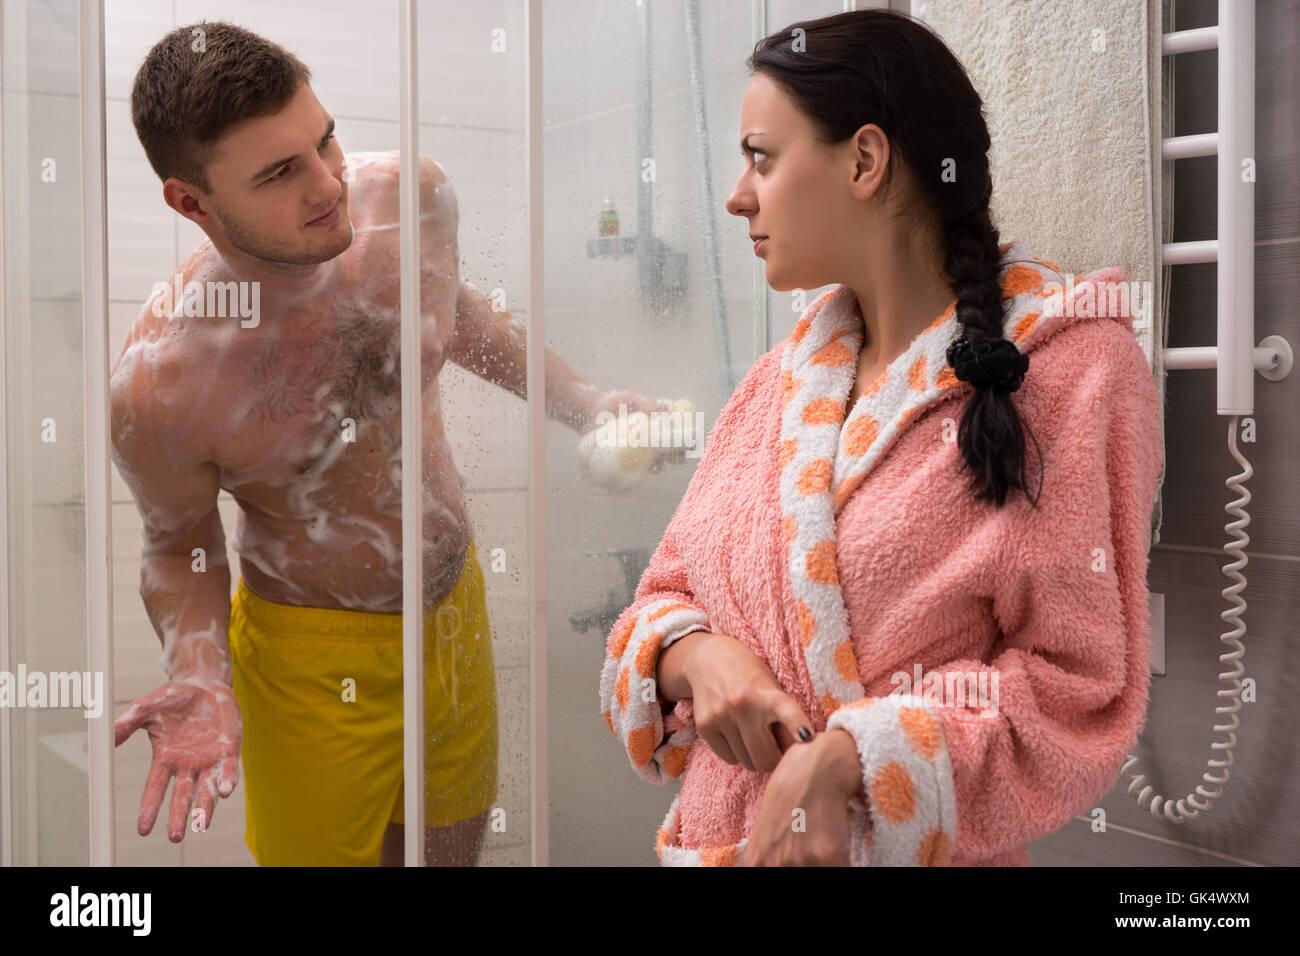 Mature women in communal shower